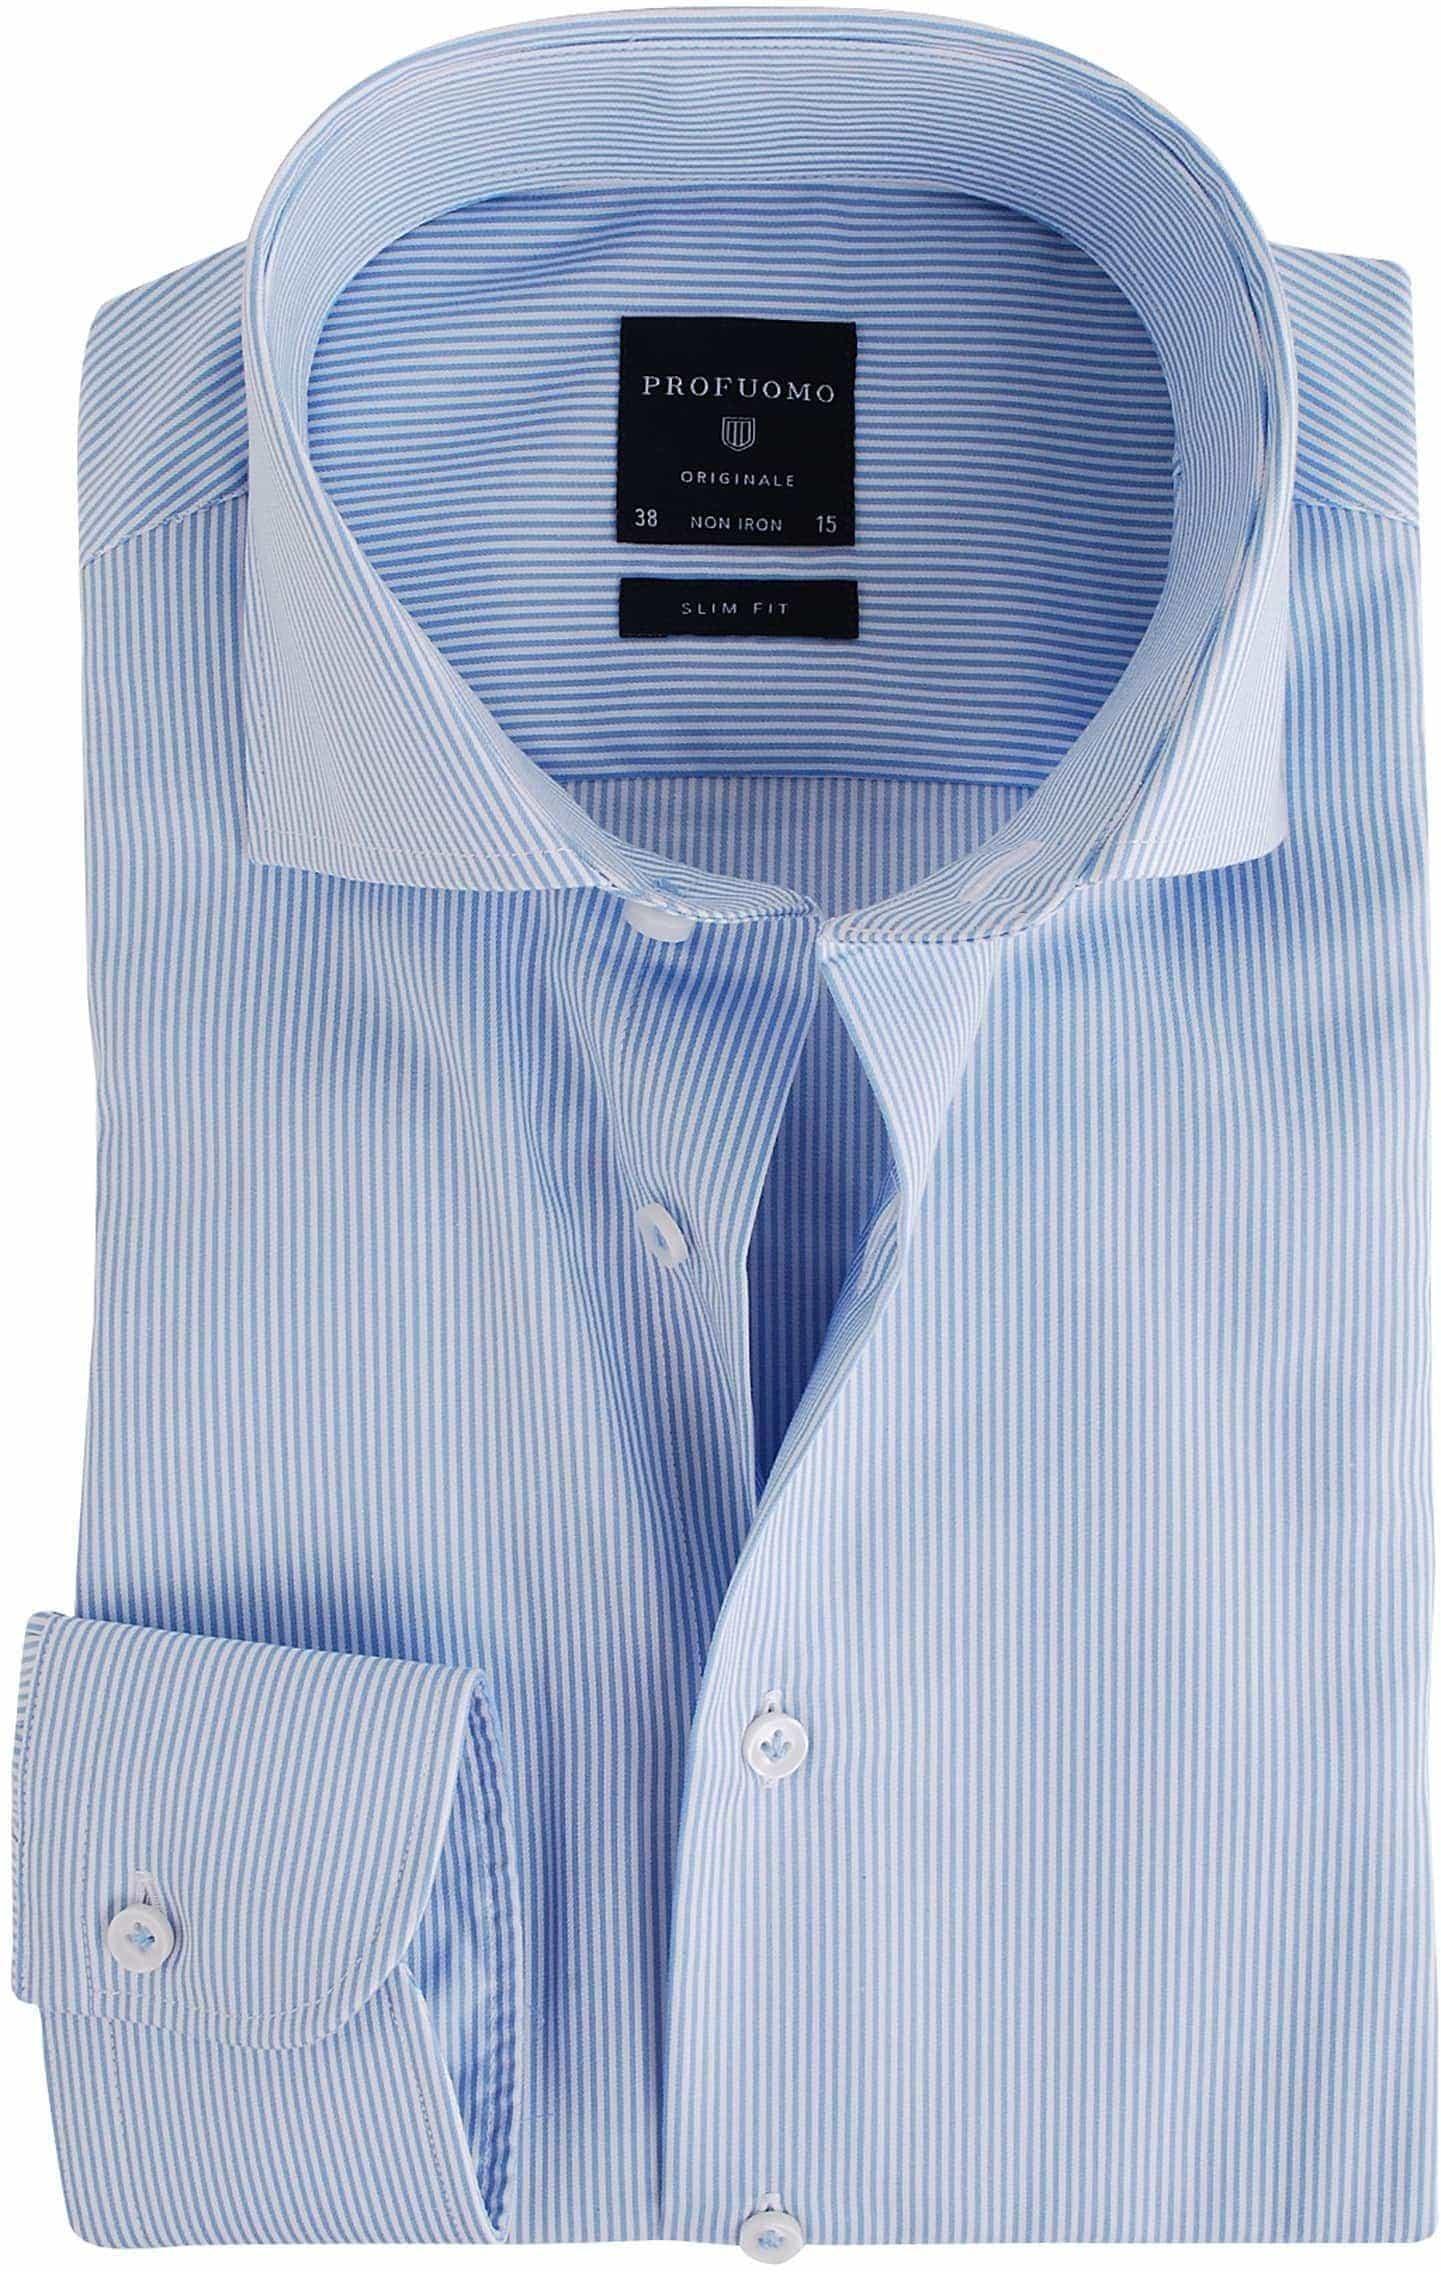 Profuomo Shirt Light Blue Striped foto 0